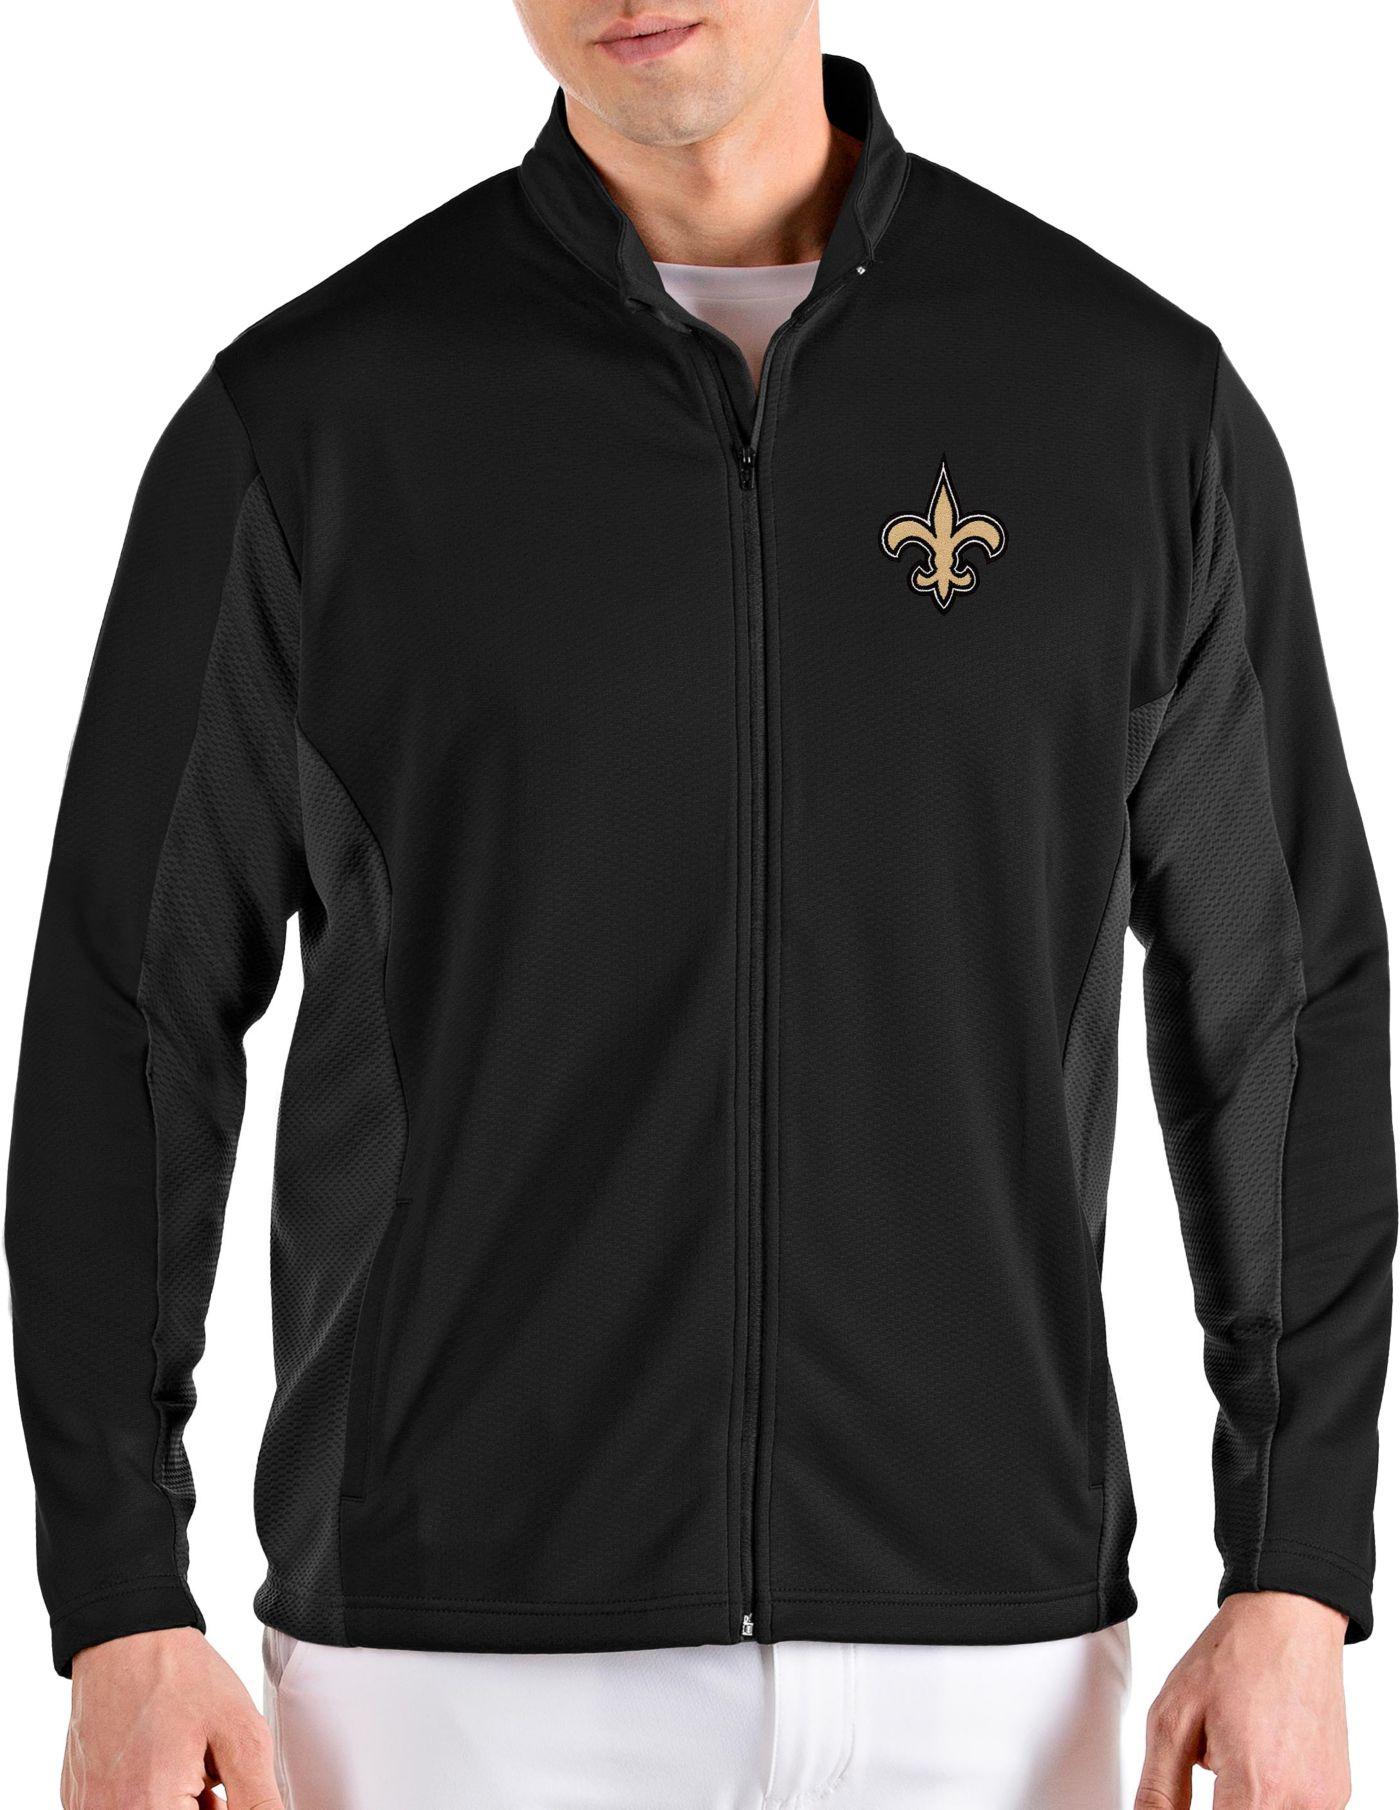 Antigua Men's New Orleans Saints Passage Black Full-Zip Jacket